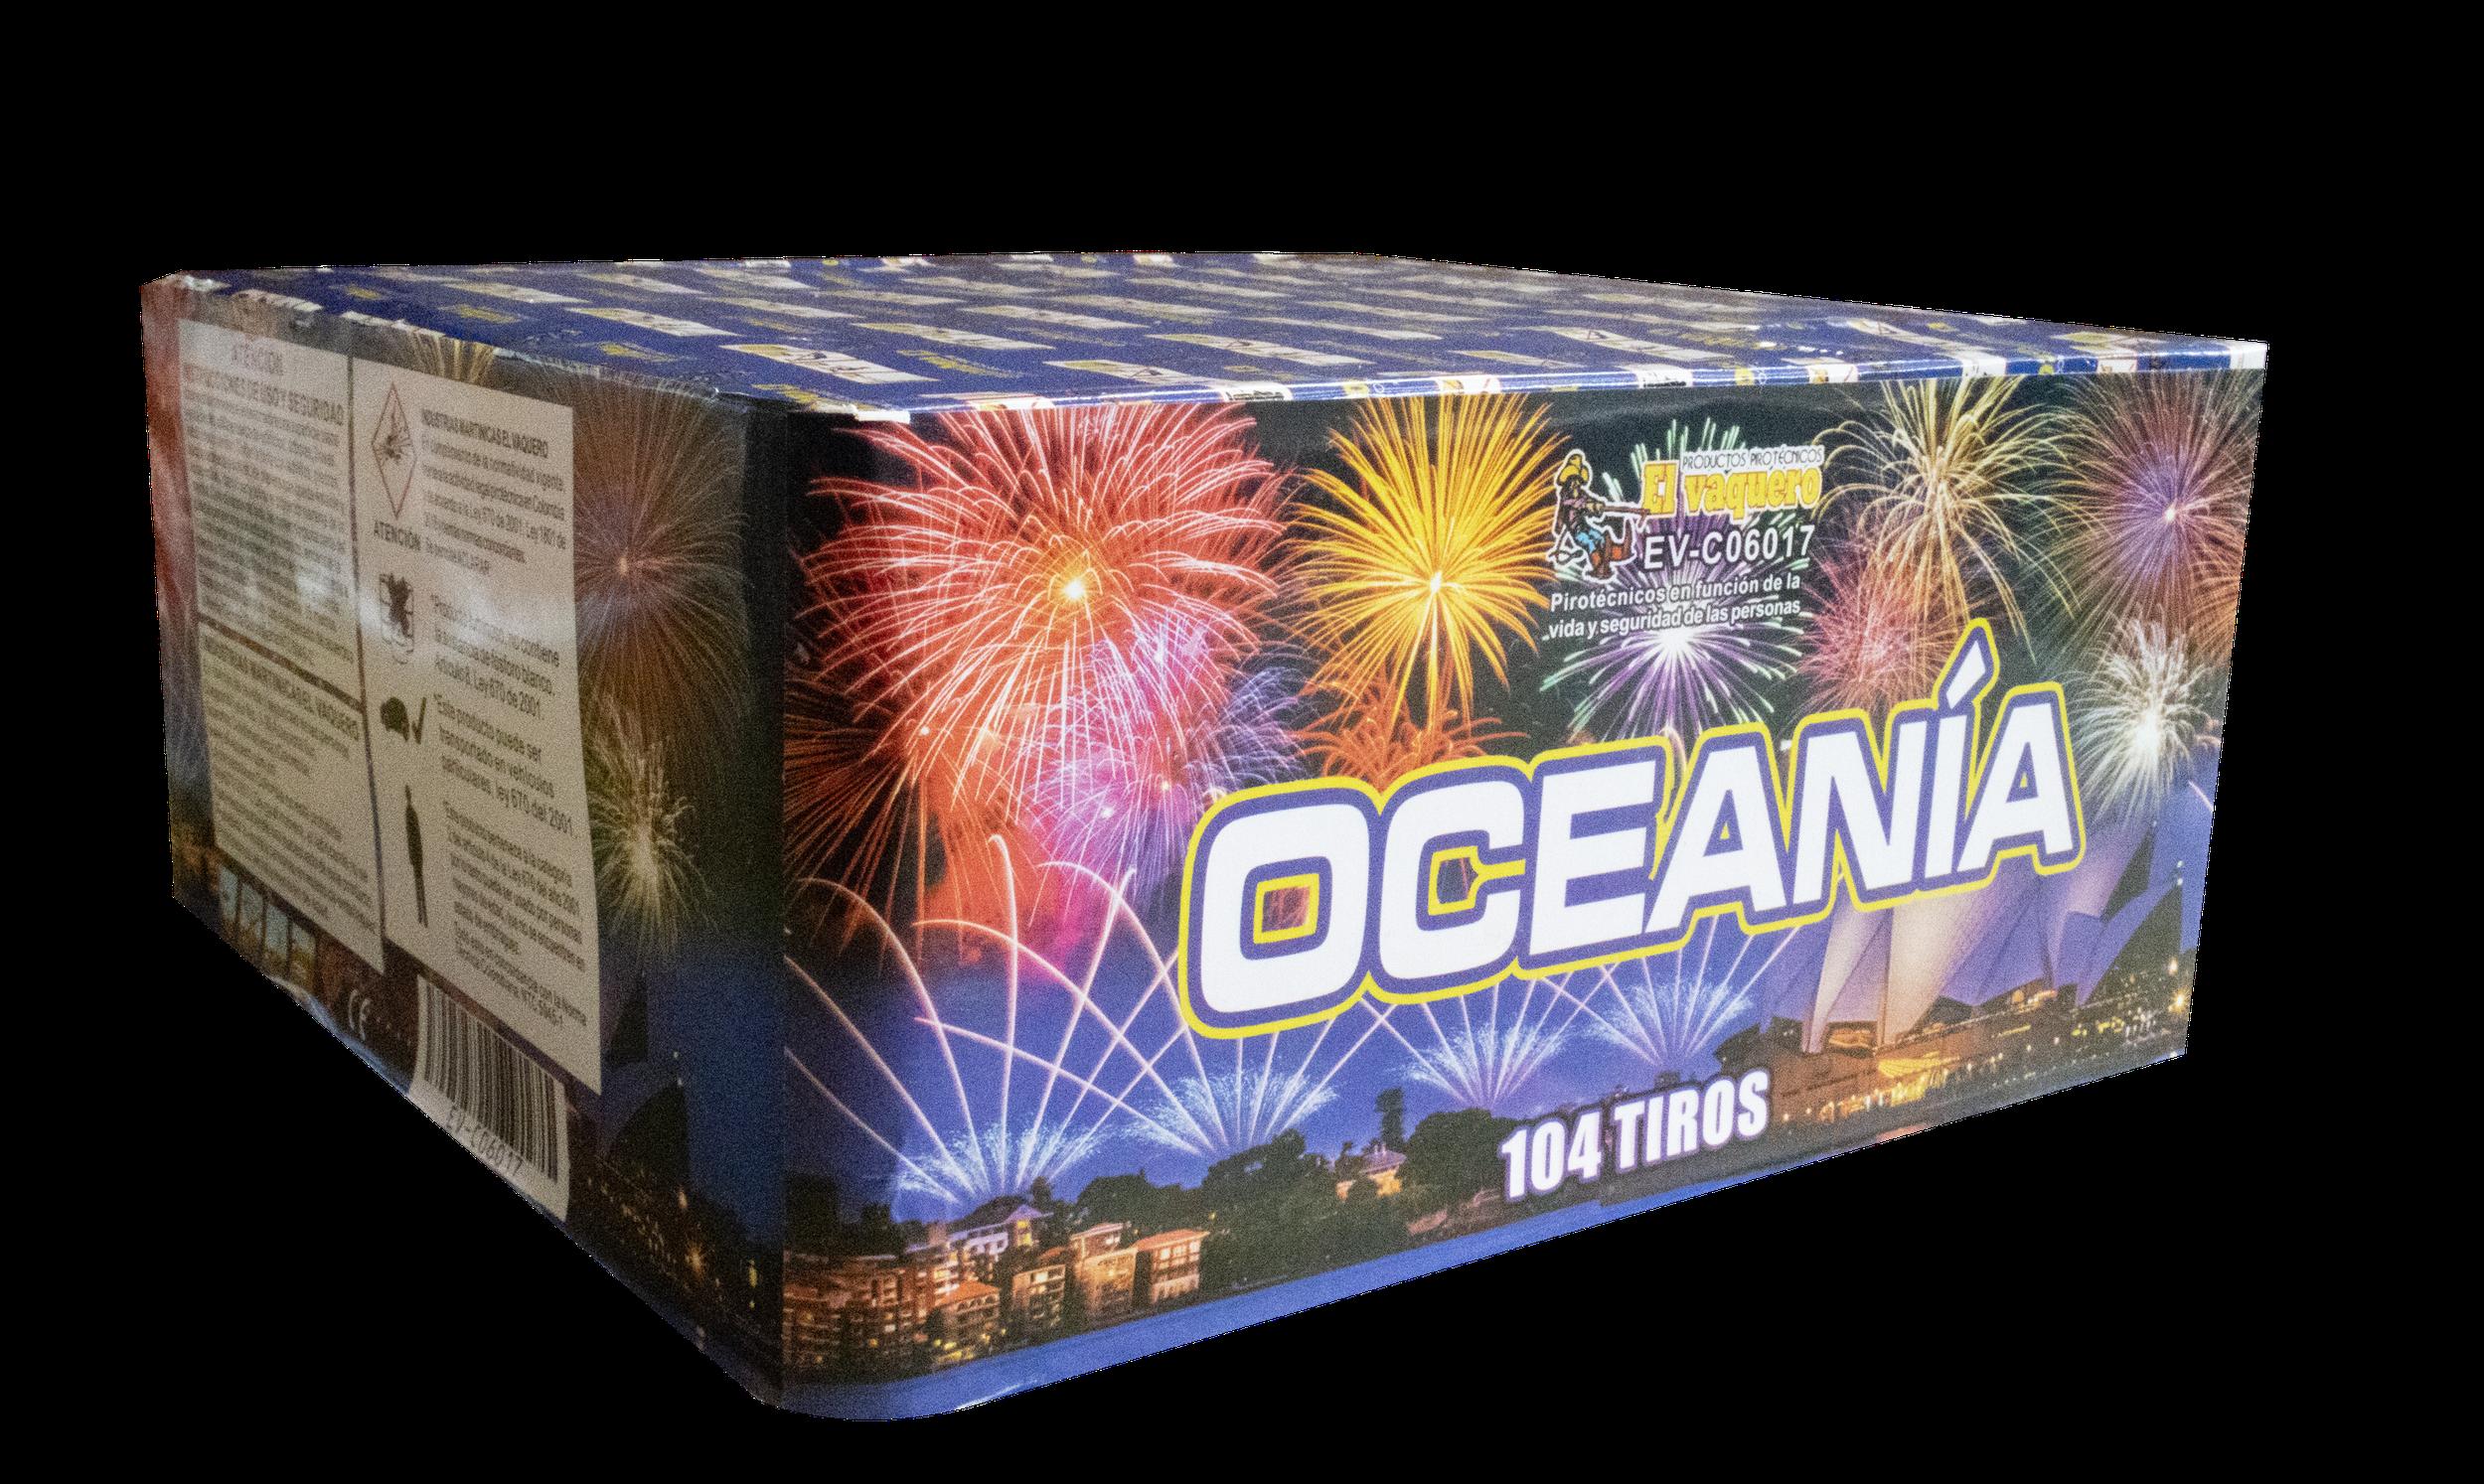 Torta Oceania 104  tiros 0.8